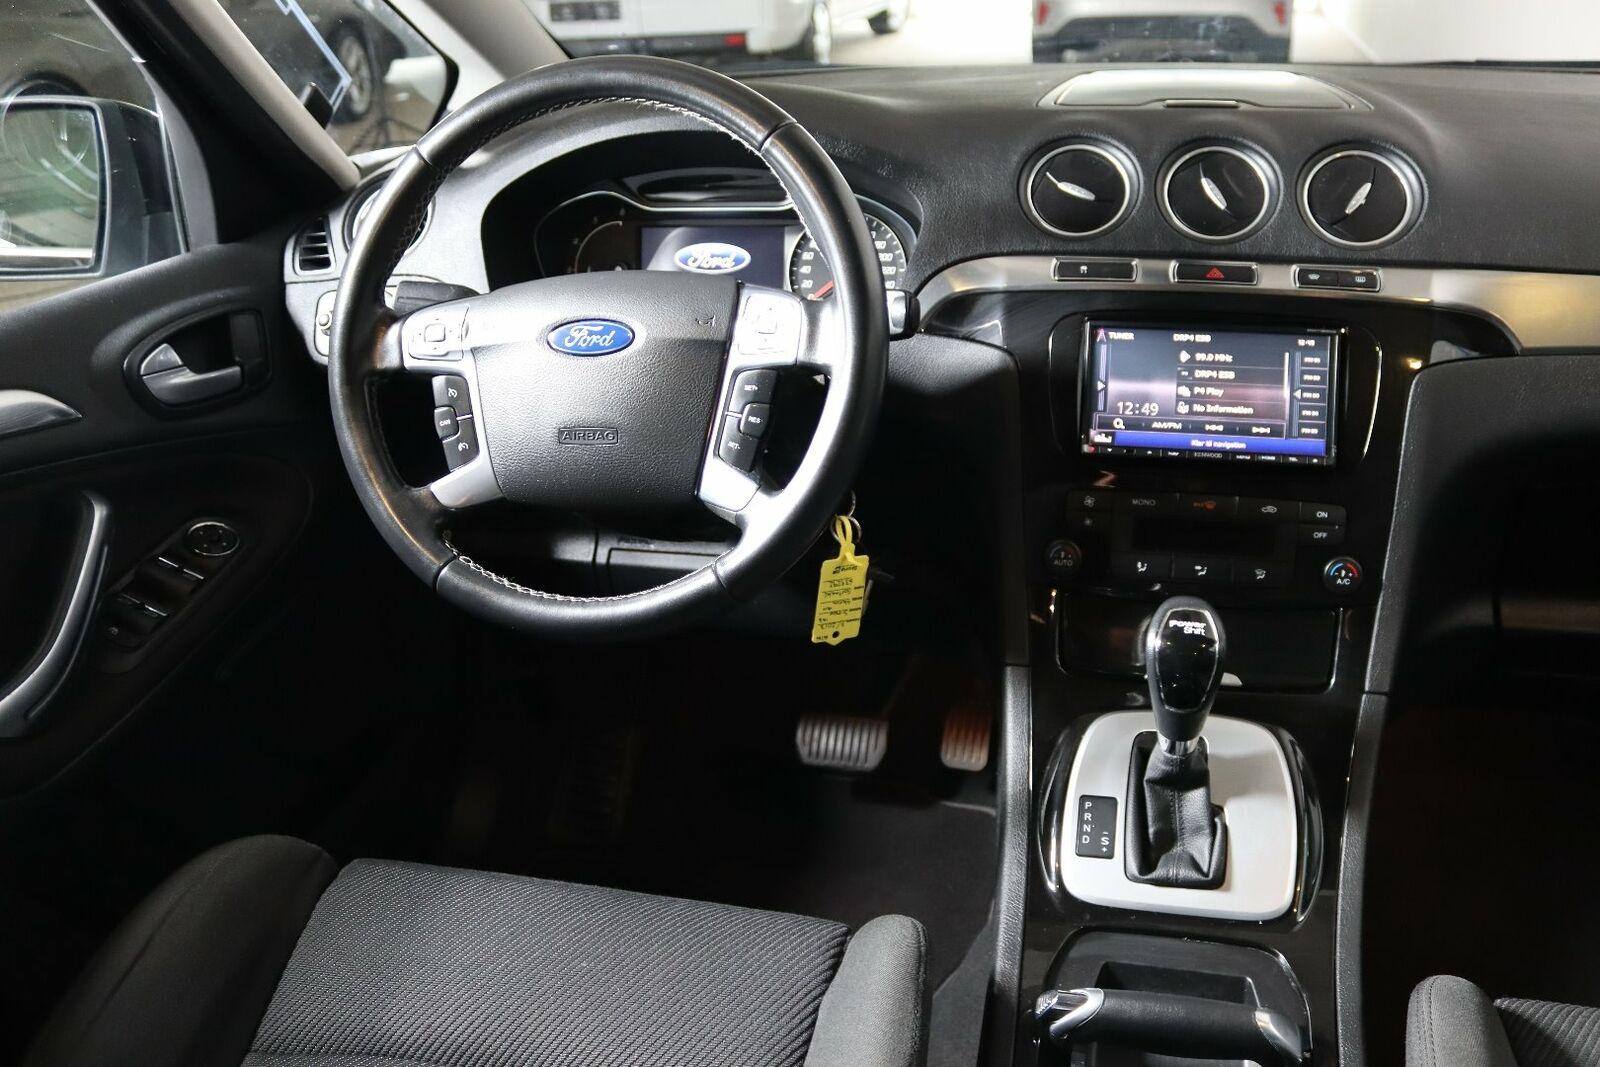 Ford S-MAX 2,0 TDCi 163 Titanium aut. 7prs - billede 10